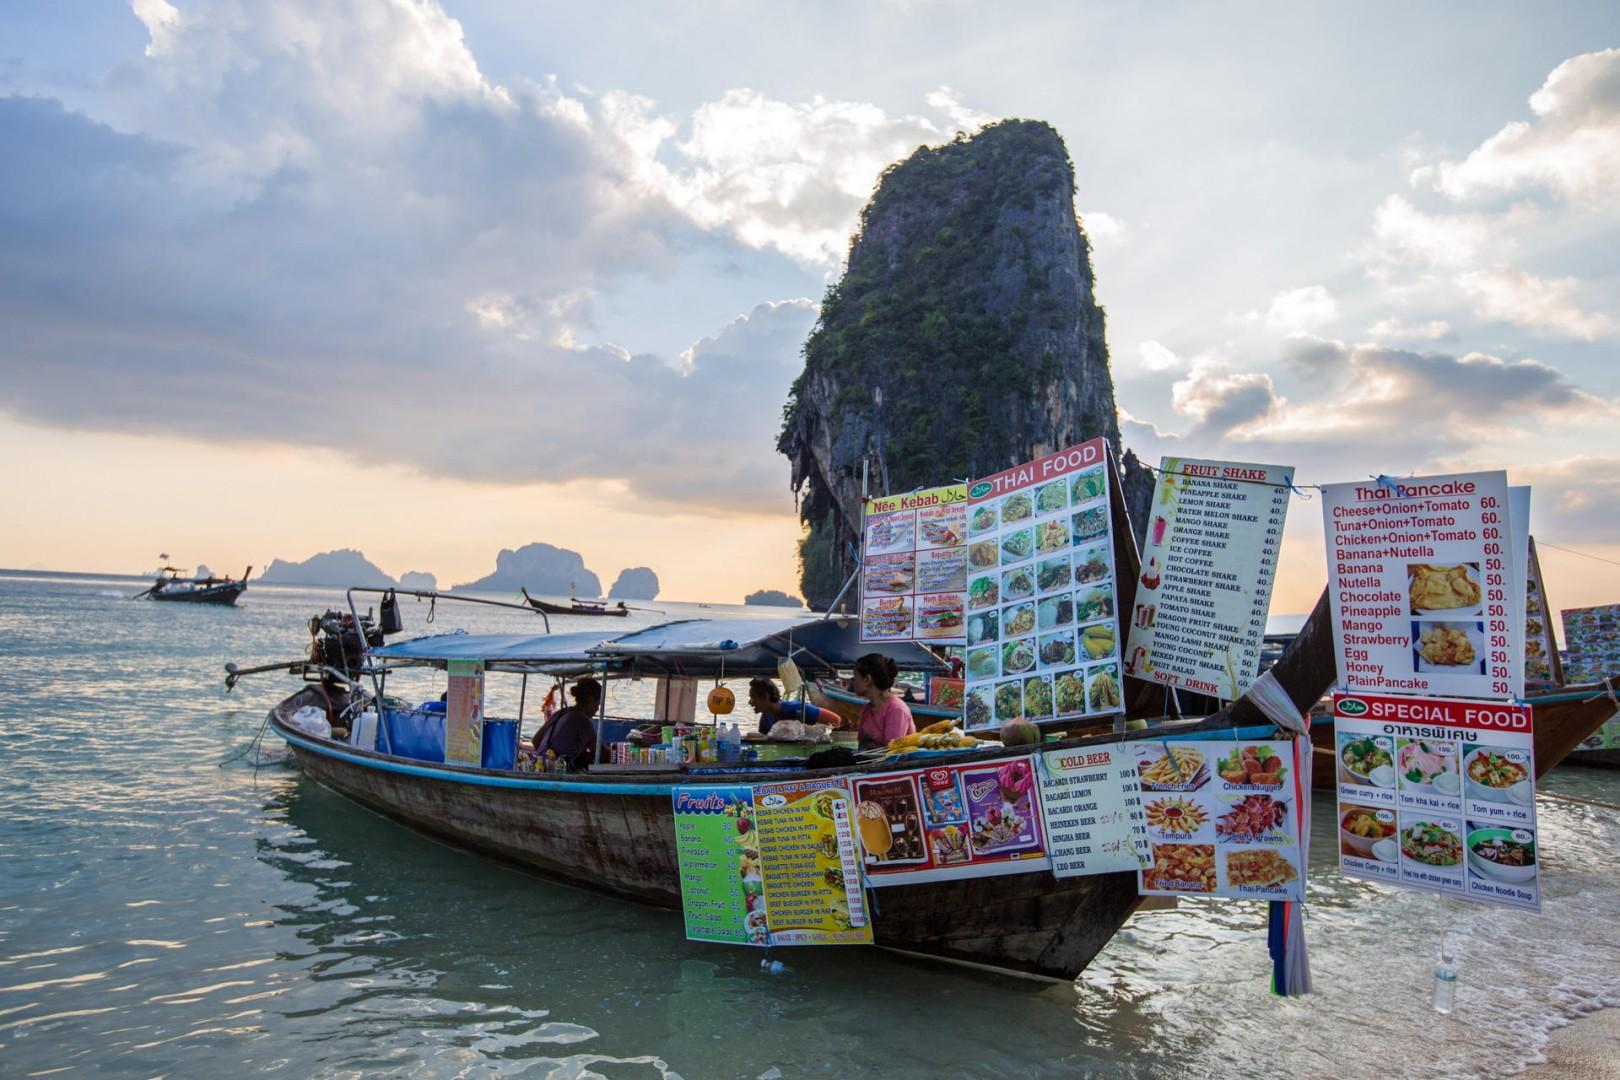 ba4397bdb18 How long-tail boats keep southern Thailand afloat